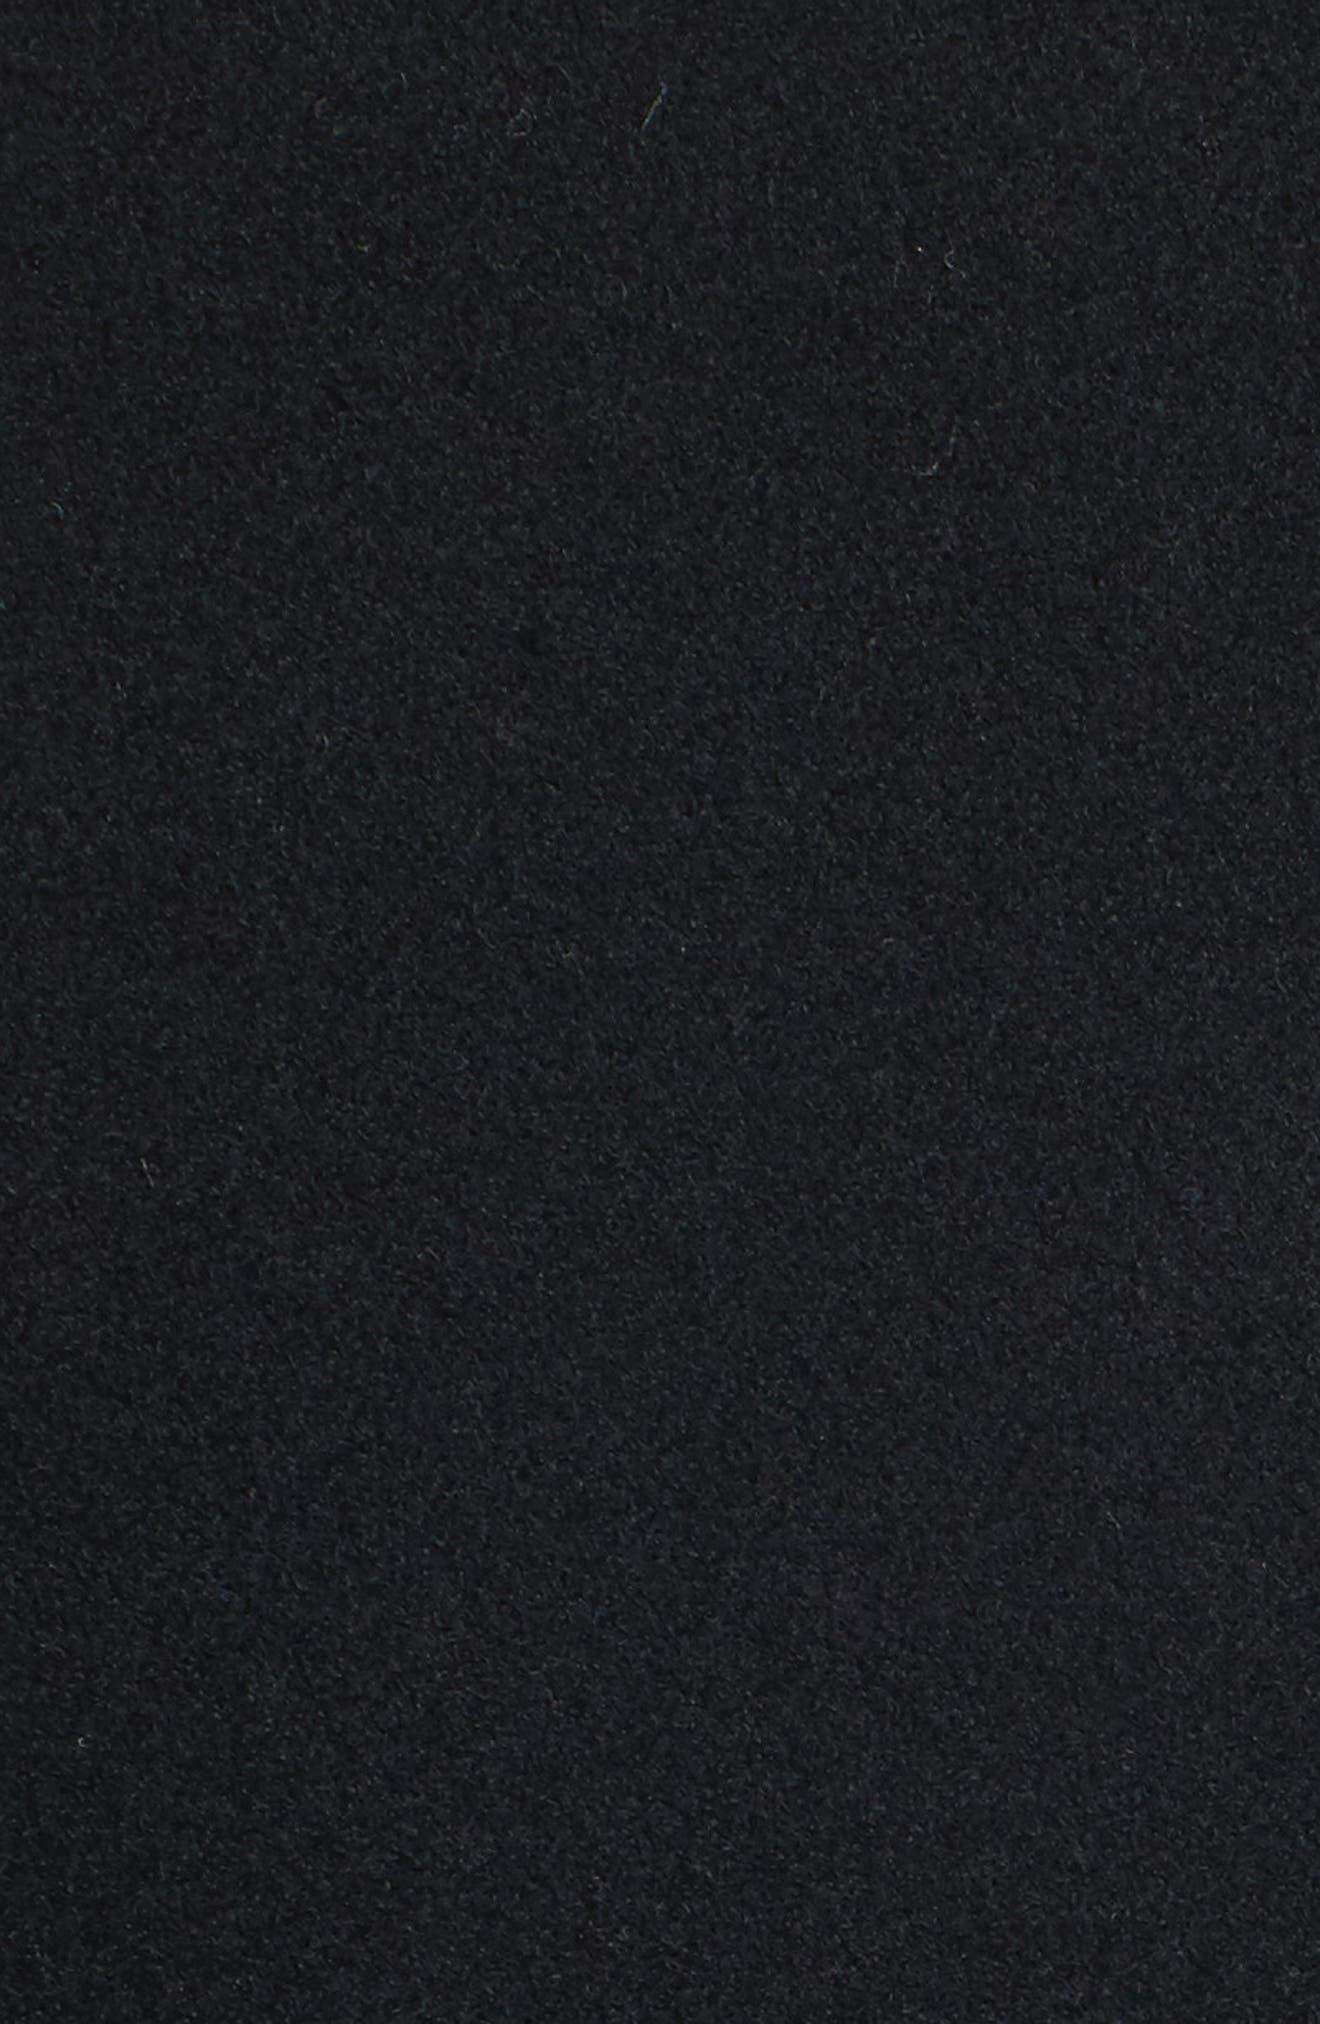 Emi Wool Blend Coat,                             Alternate thumbnail 6, color,                             001